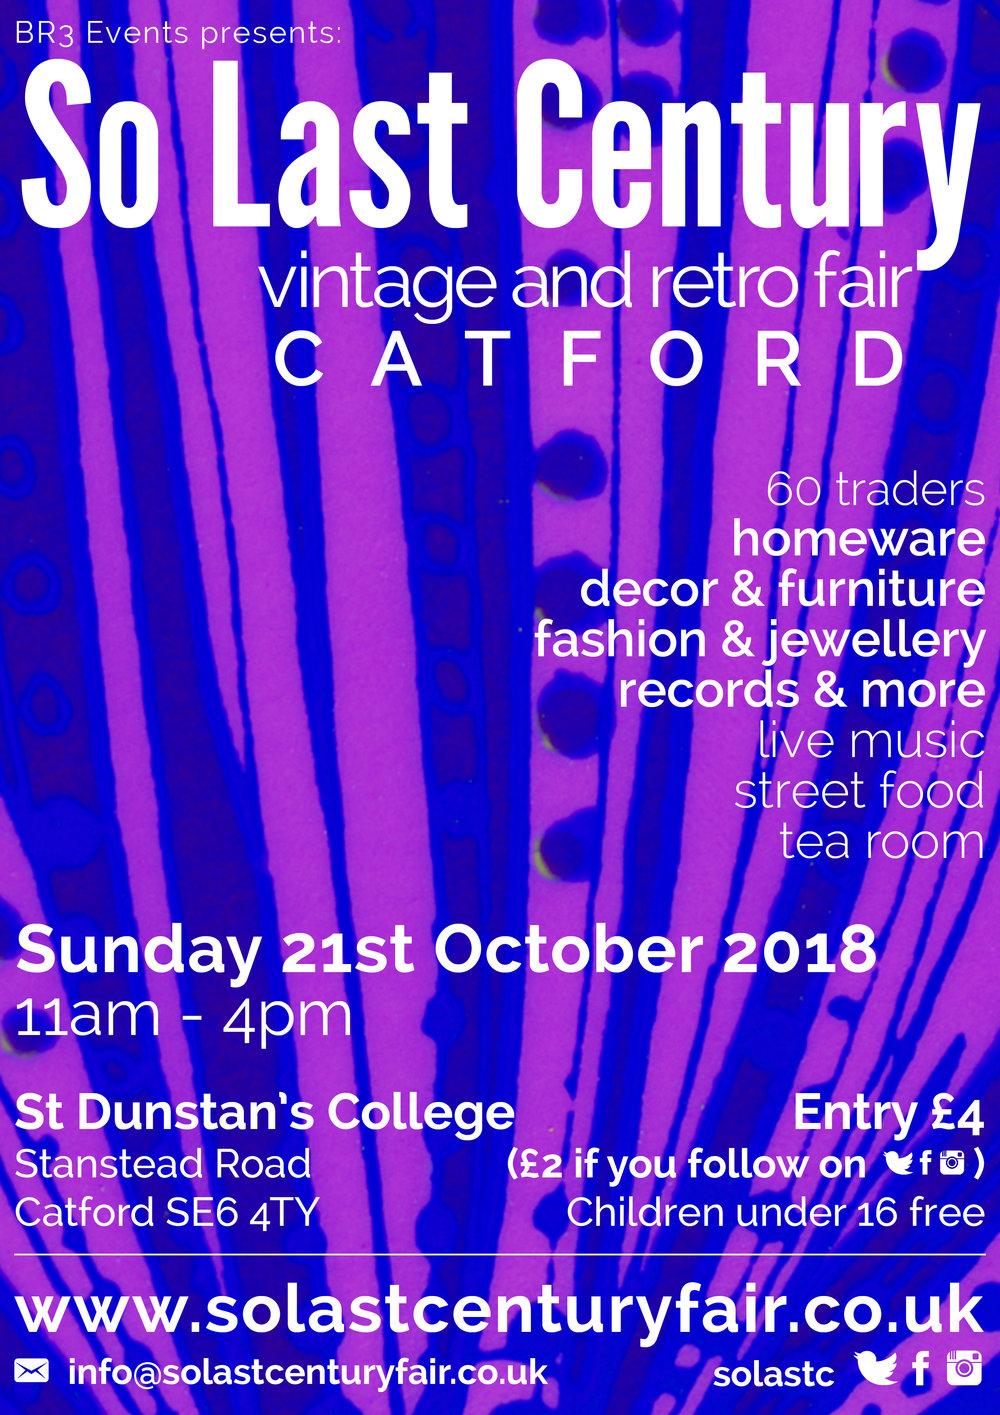 Oct 18 Poster blue purple int.jpg